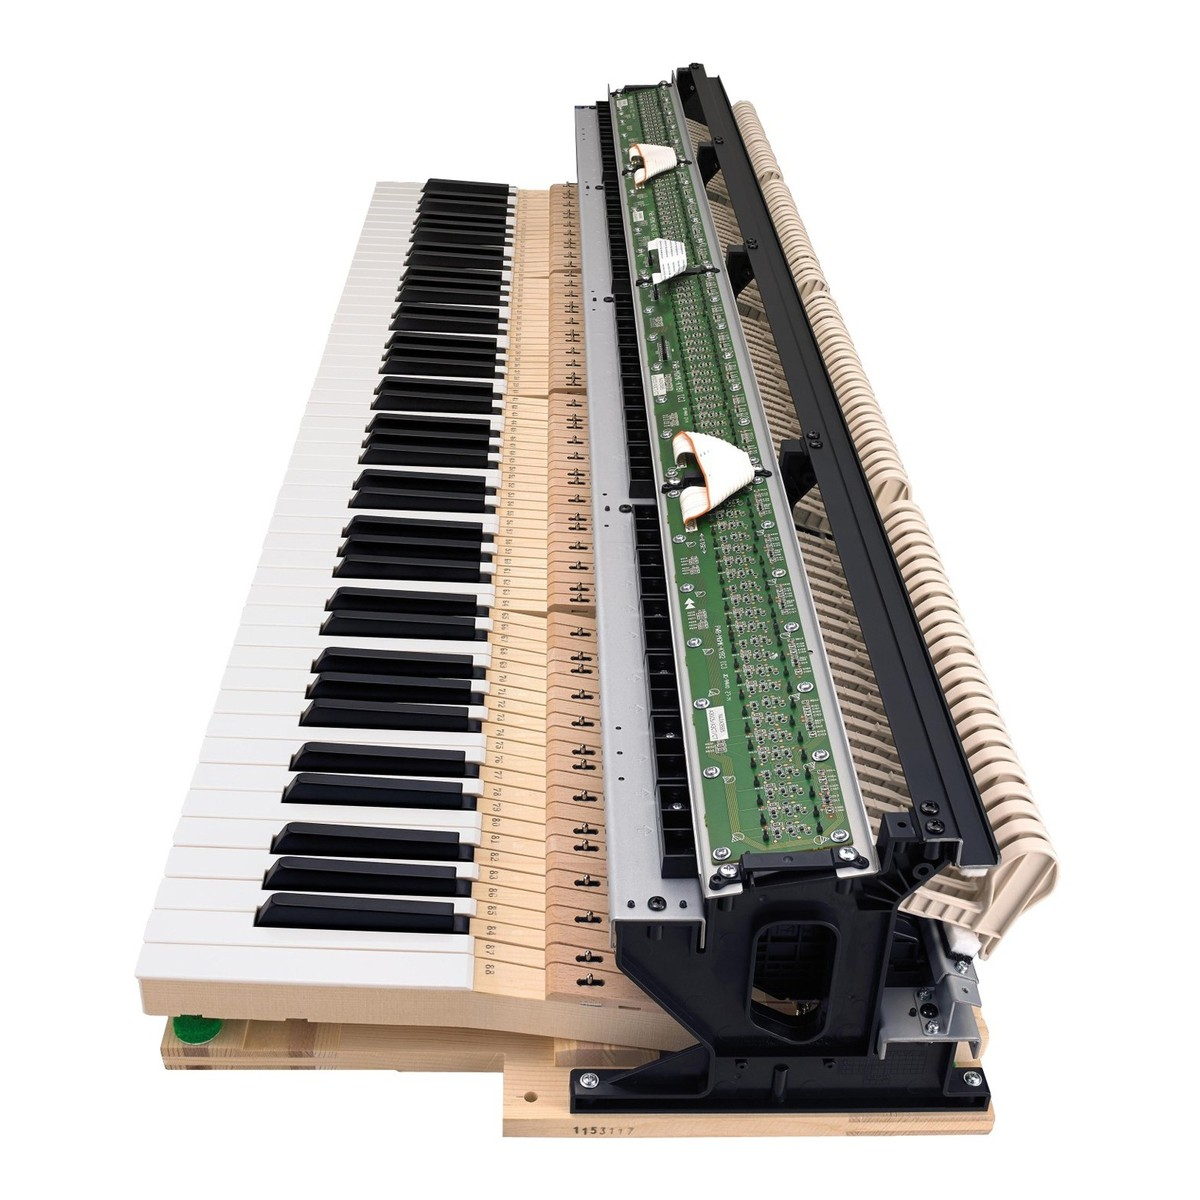 Casio GP-300BK Grand Hybrid Piano key cross section